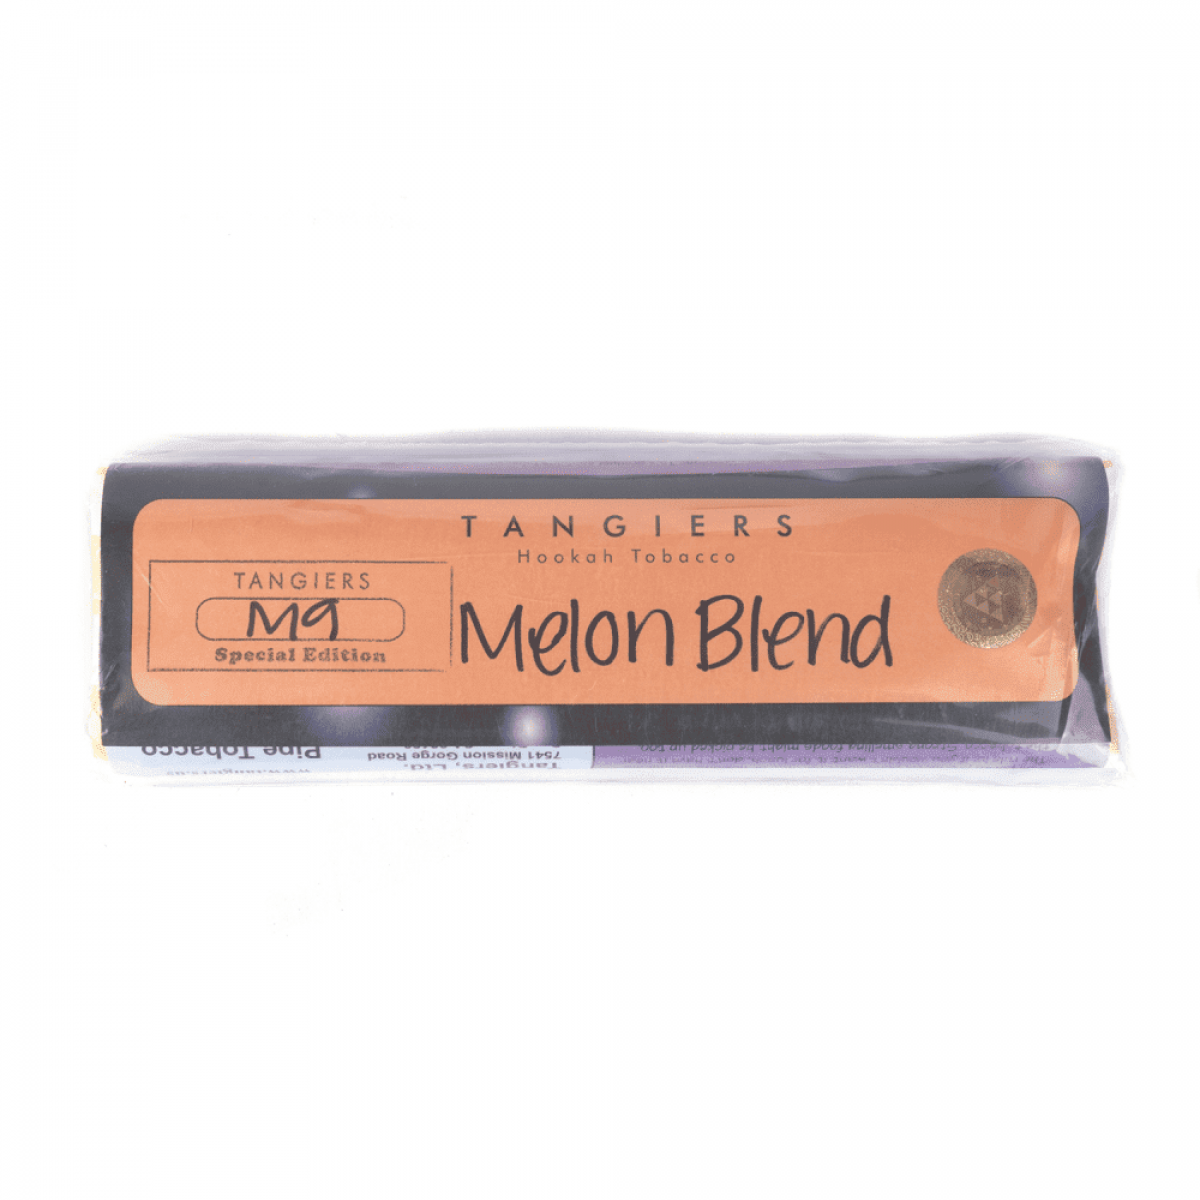 Табак Tangiers Melon blend Special Edition (Танжирс Дыня Лимитированная линейка) 250 грамм